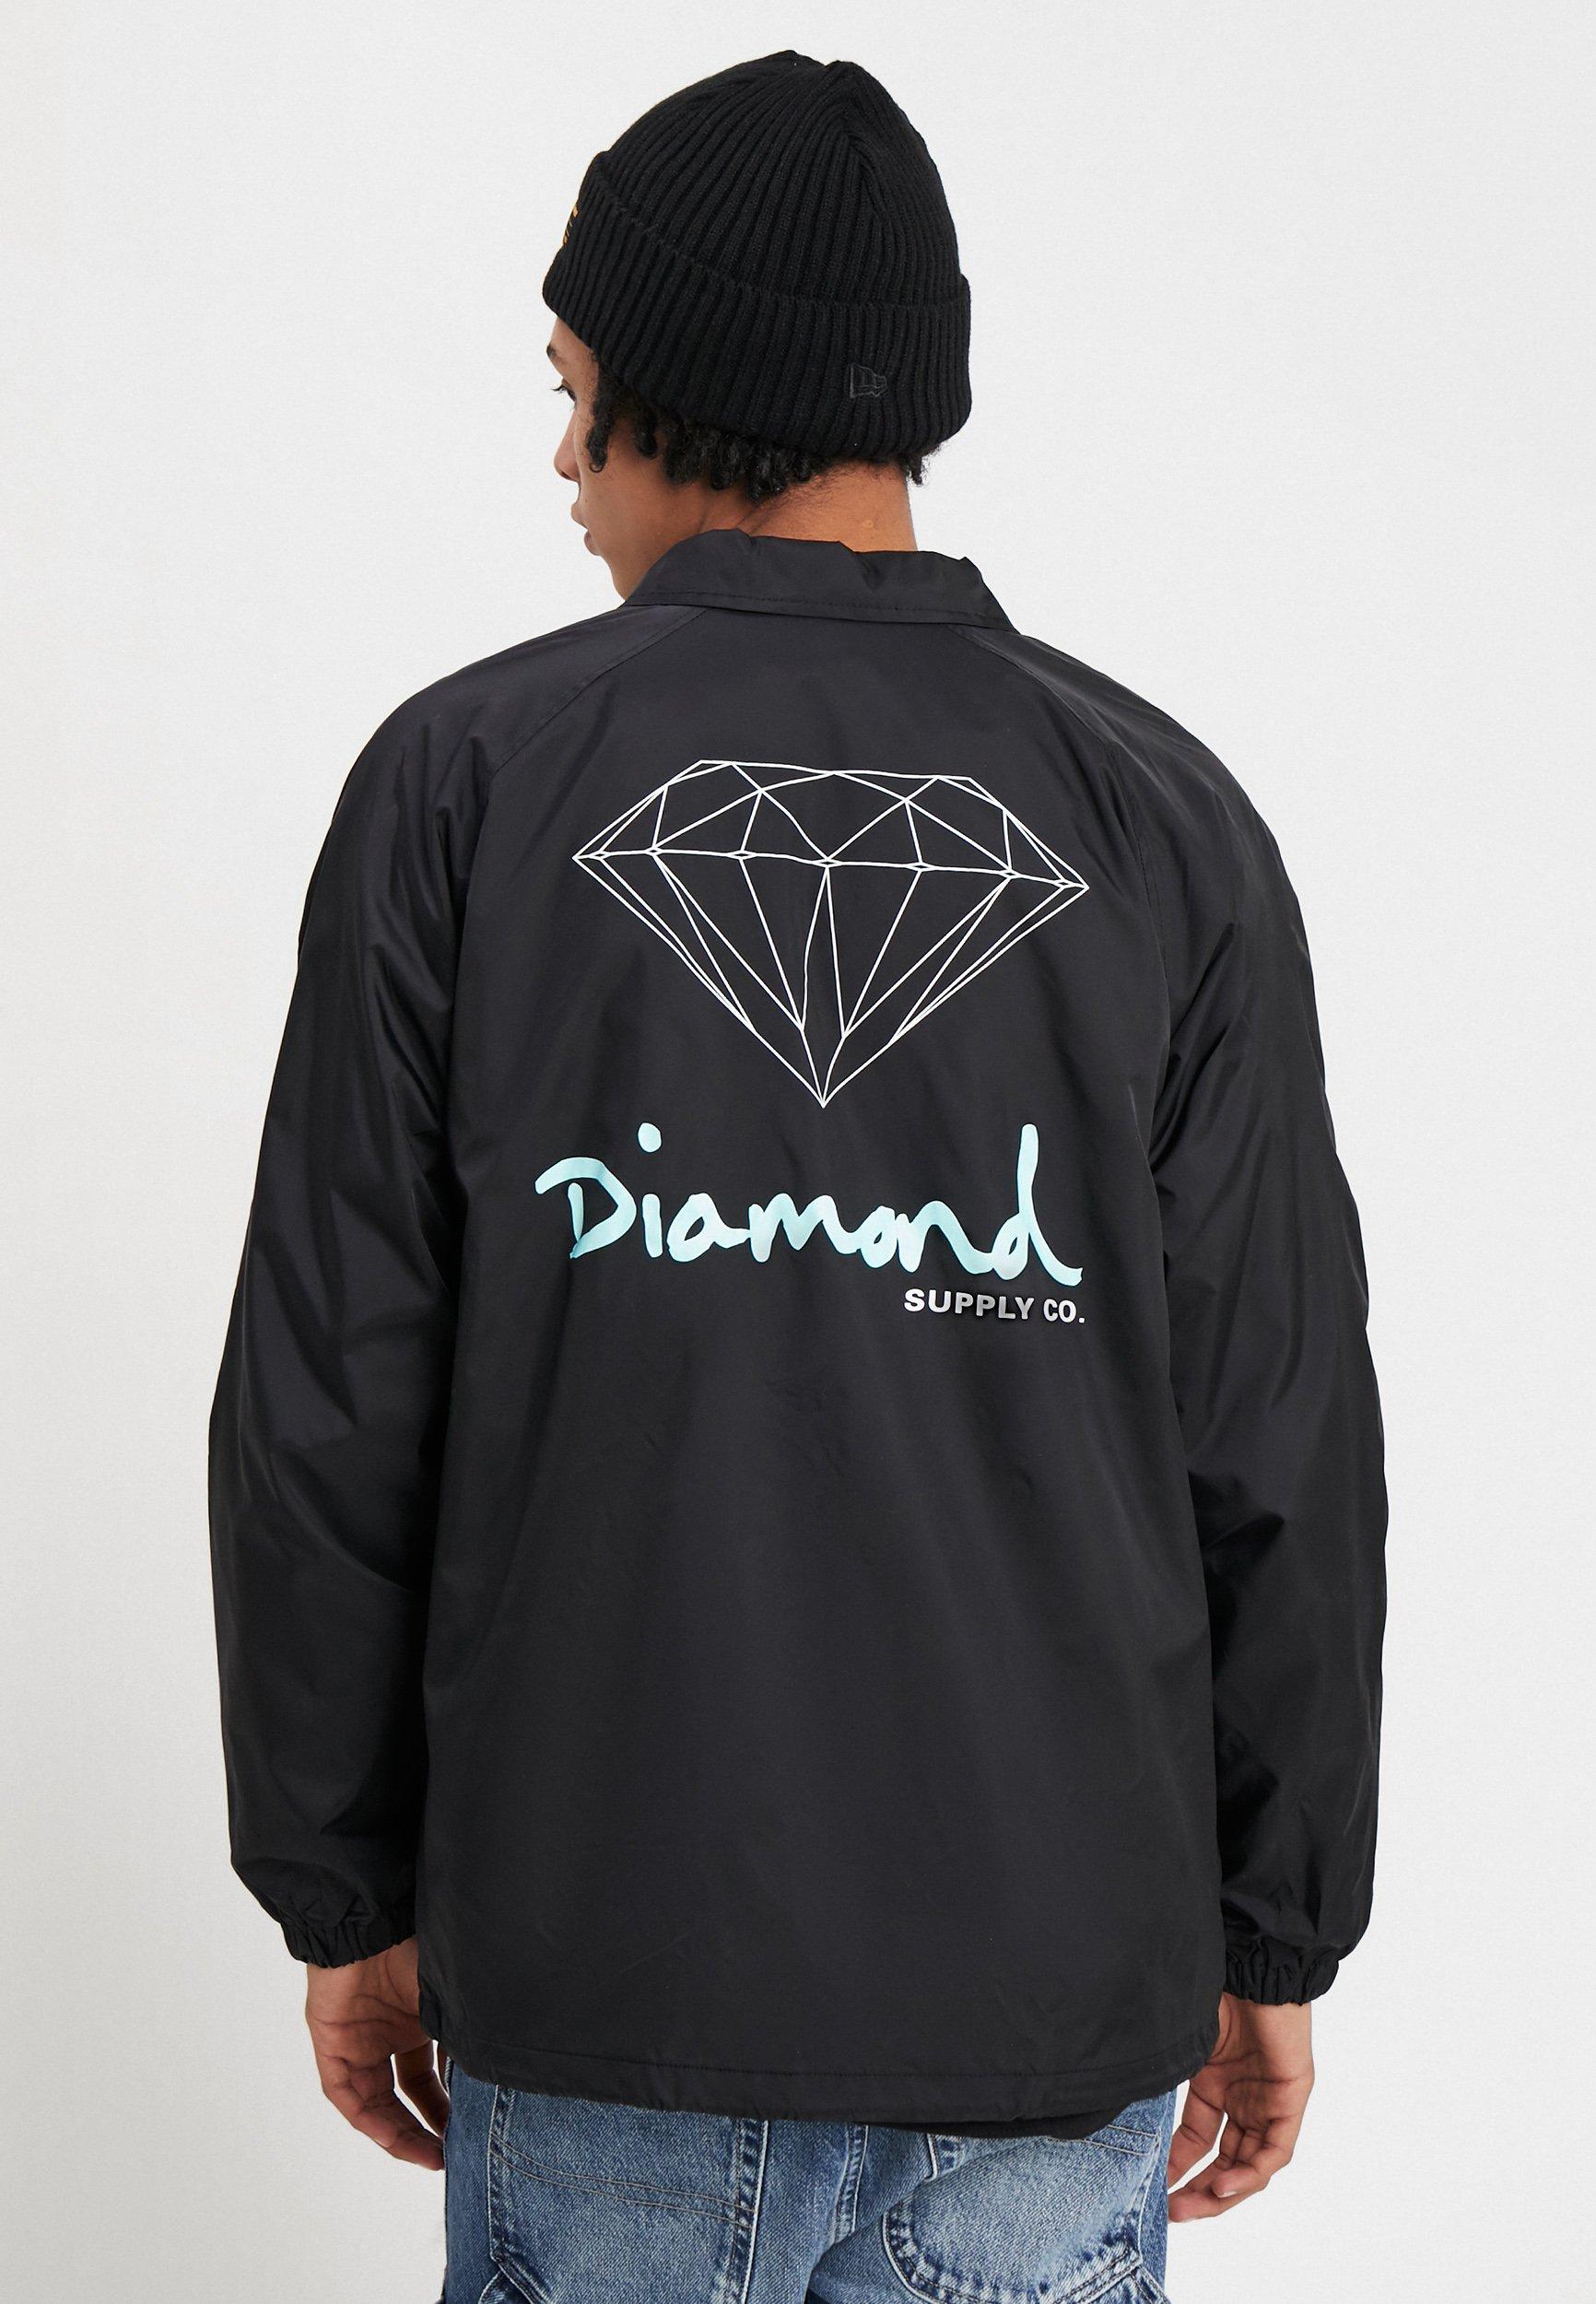 Diamond CoSign CoachGiacca Supply Leggera Black JK1Tlc3F